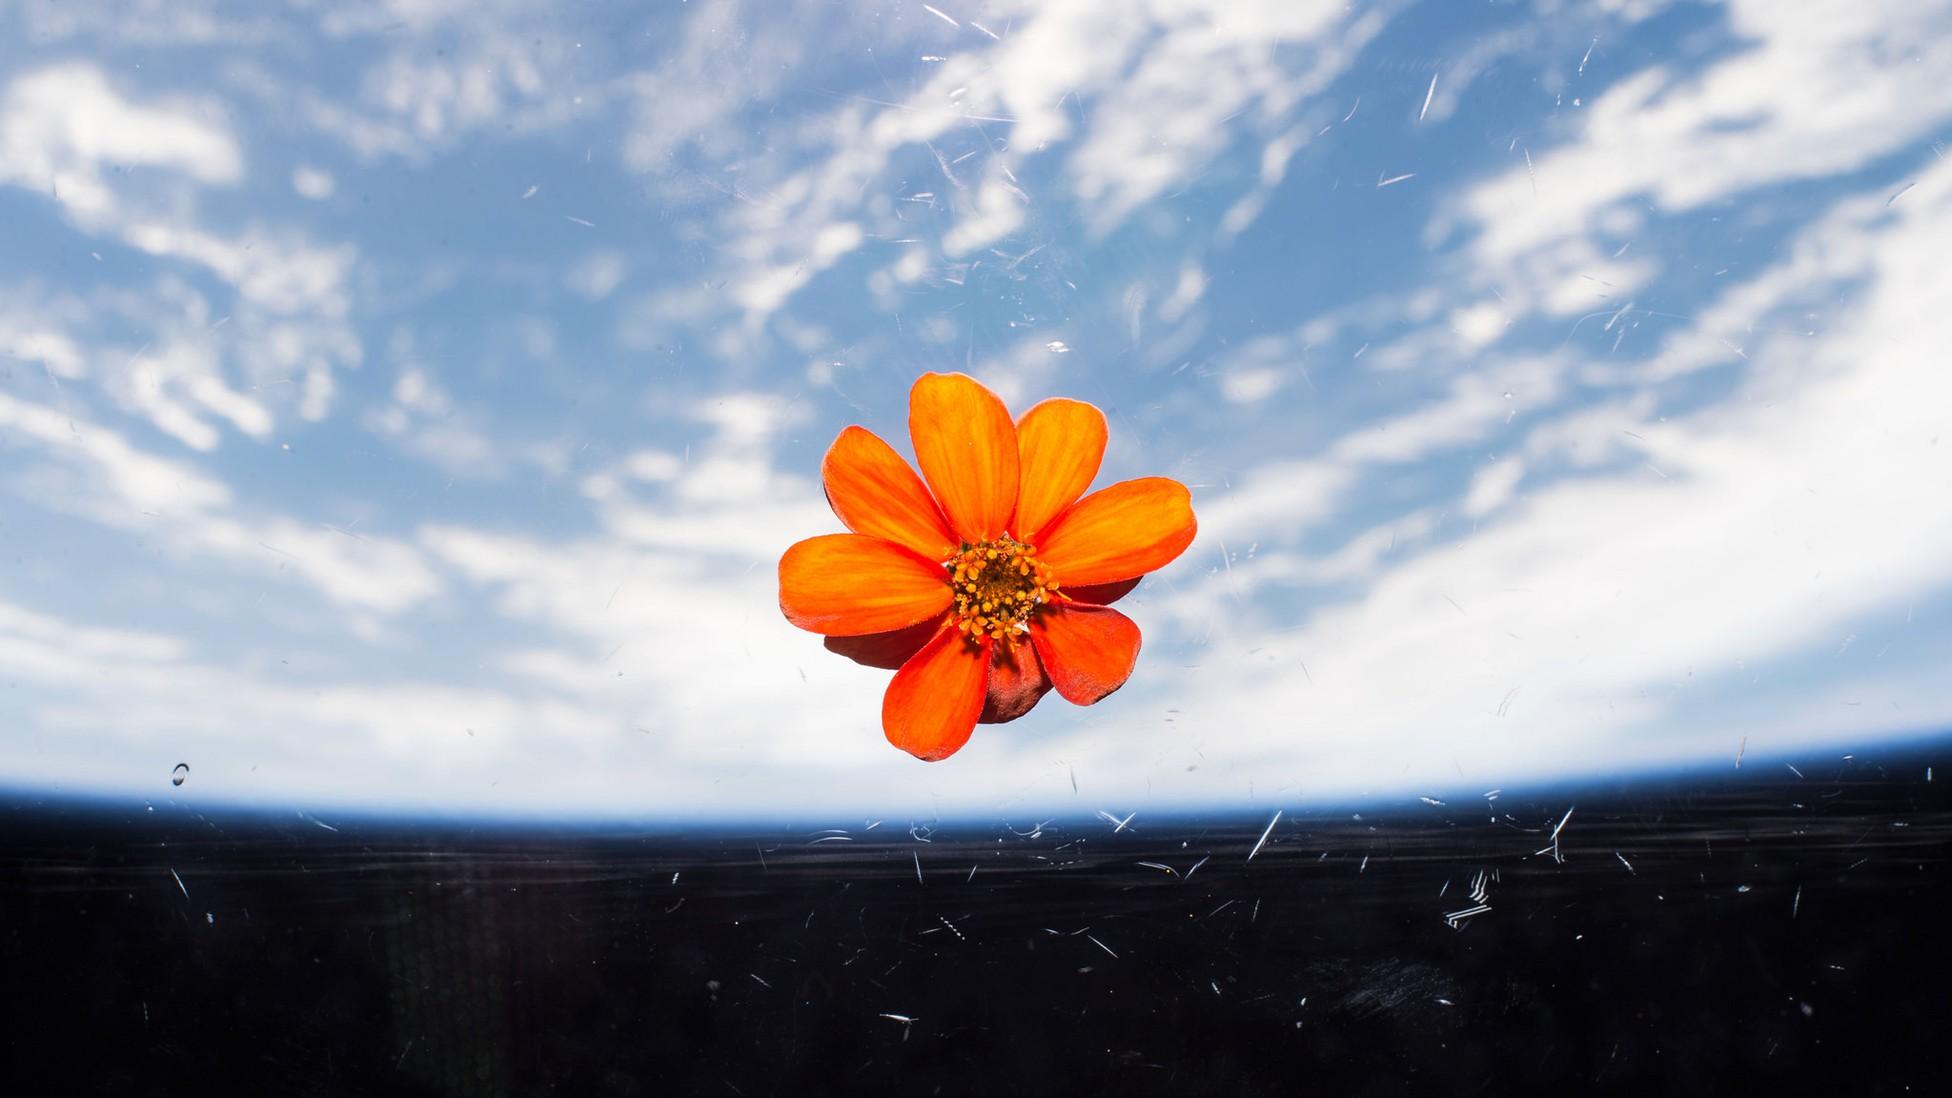 flower space planet terraforming romance